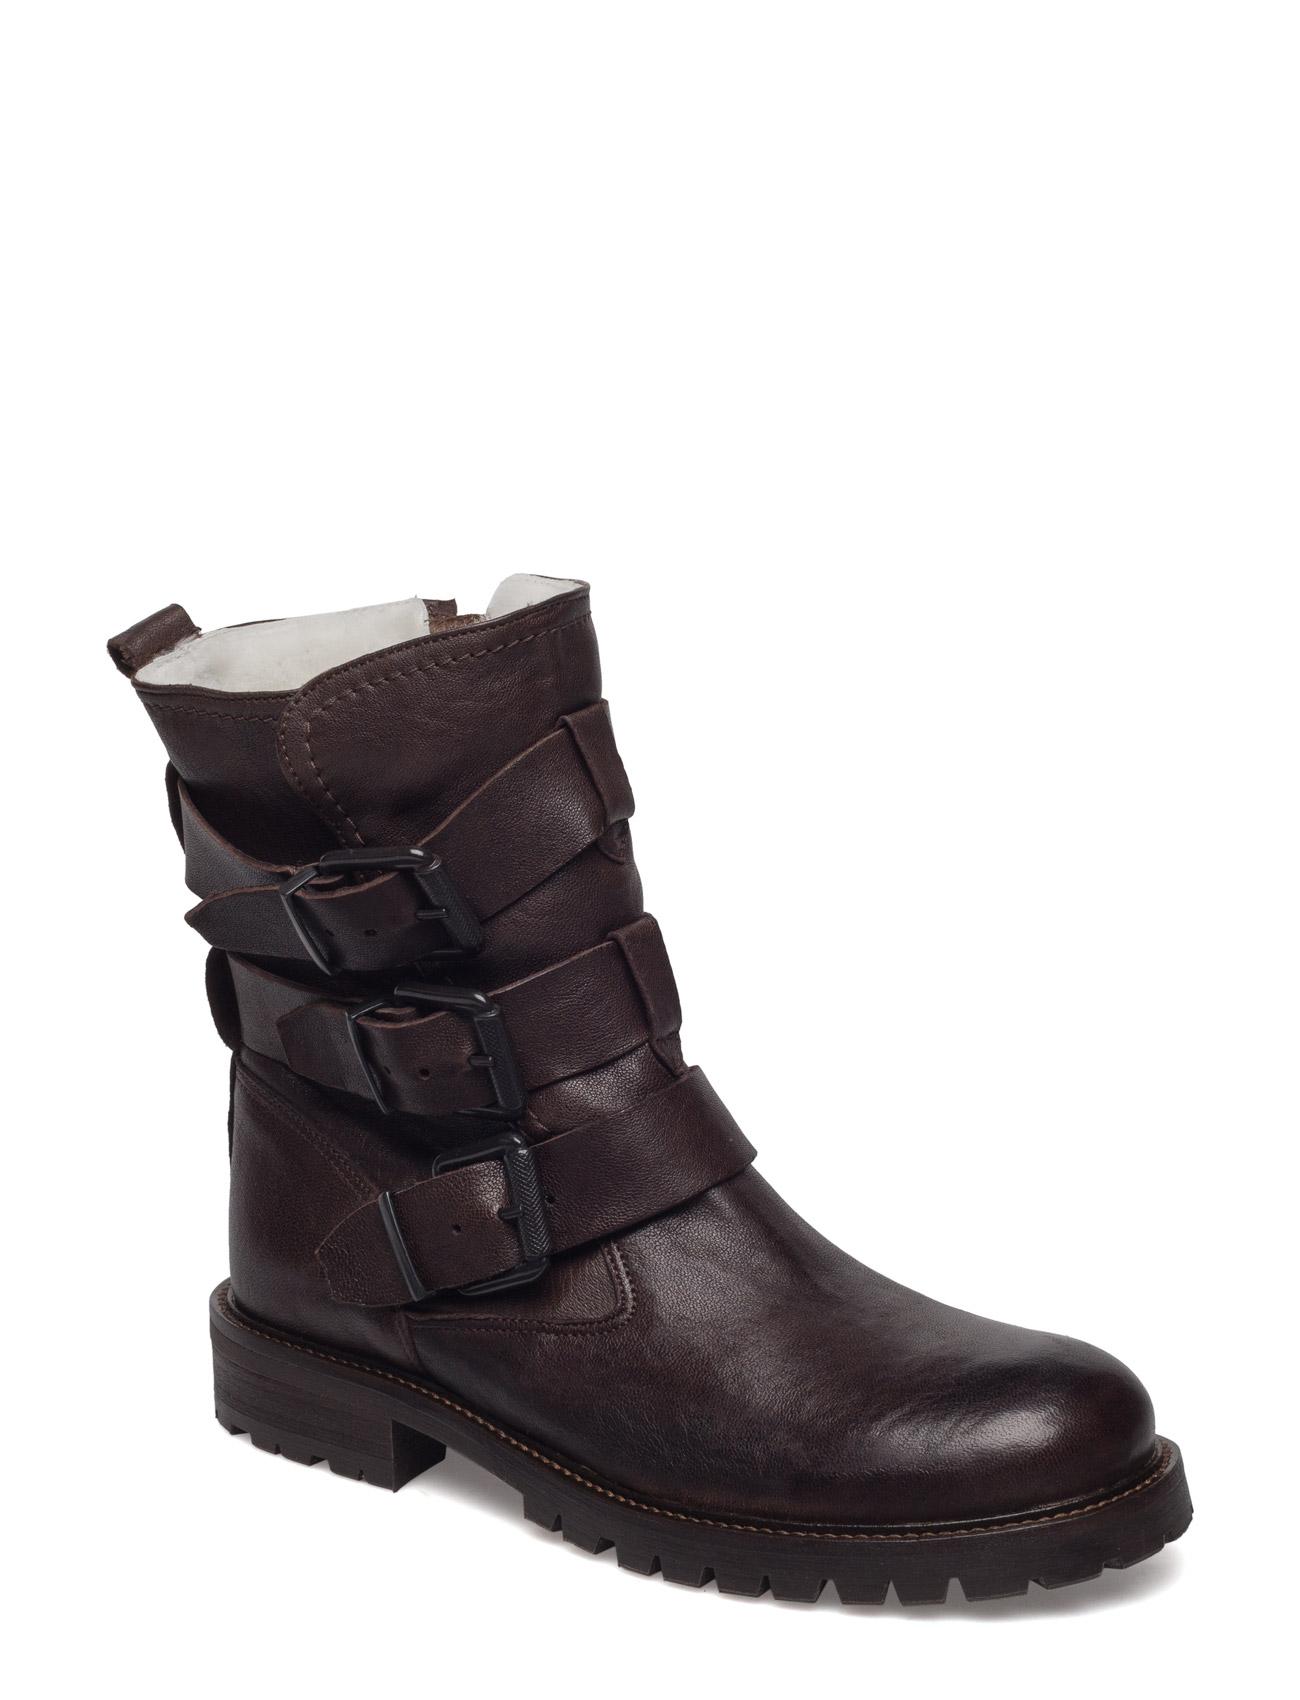 Boots Billi Bi Støvler til Damer i